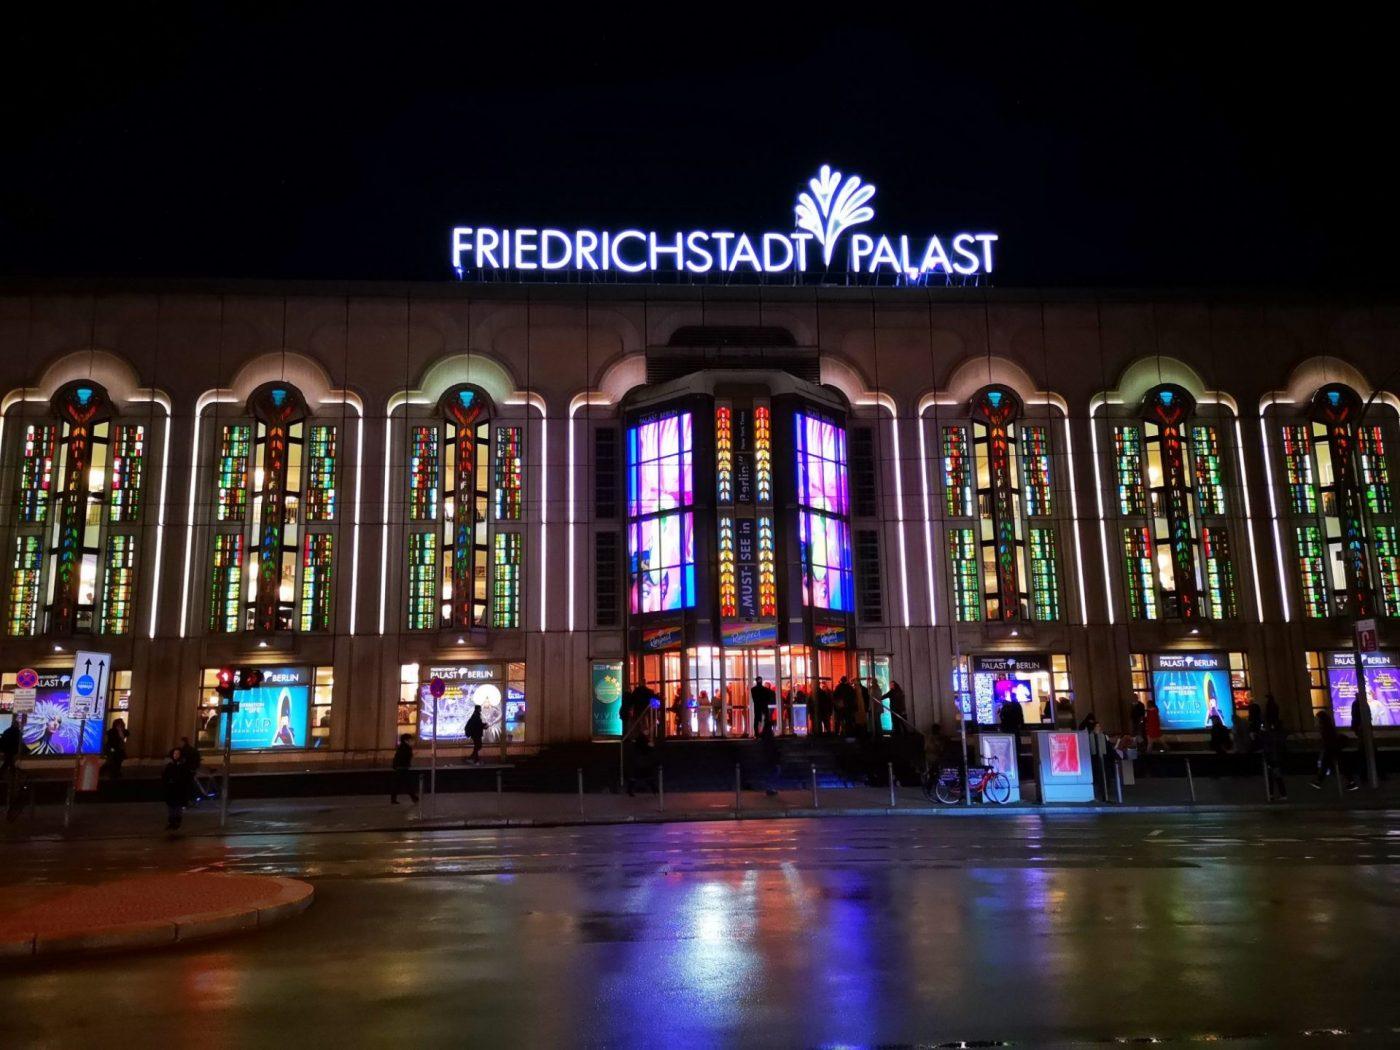 Watching the VIVID Grand Show at the Palast Berlin